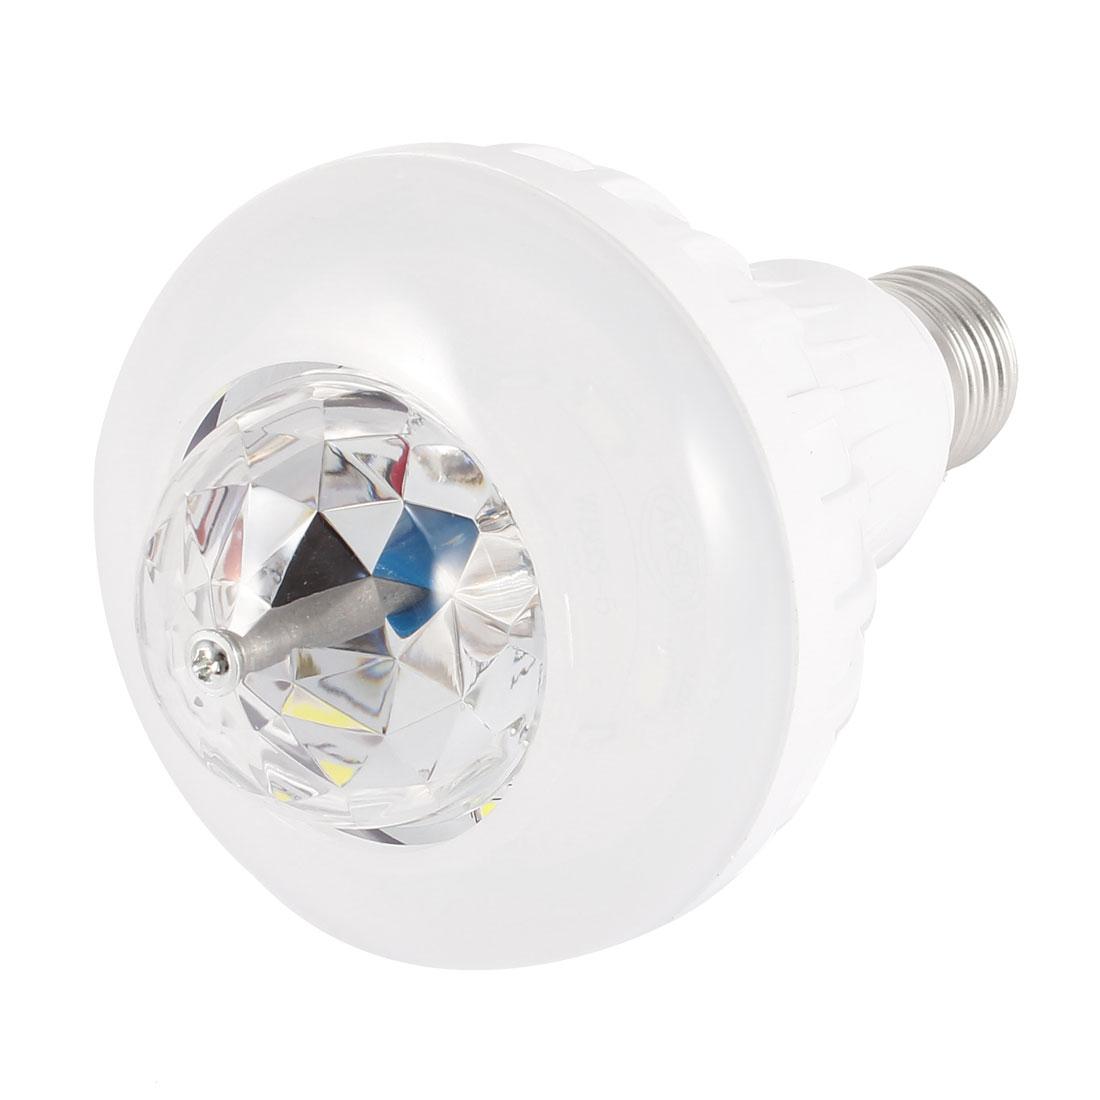 AC 85-260V 3W E27 Party DJ Dance Stage Blue LED Light Rotating Ball Lamp Bulb